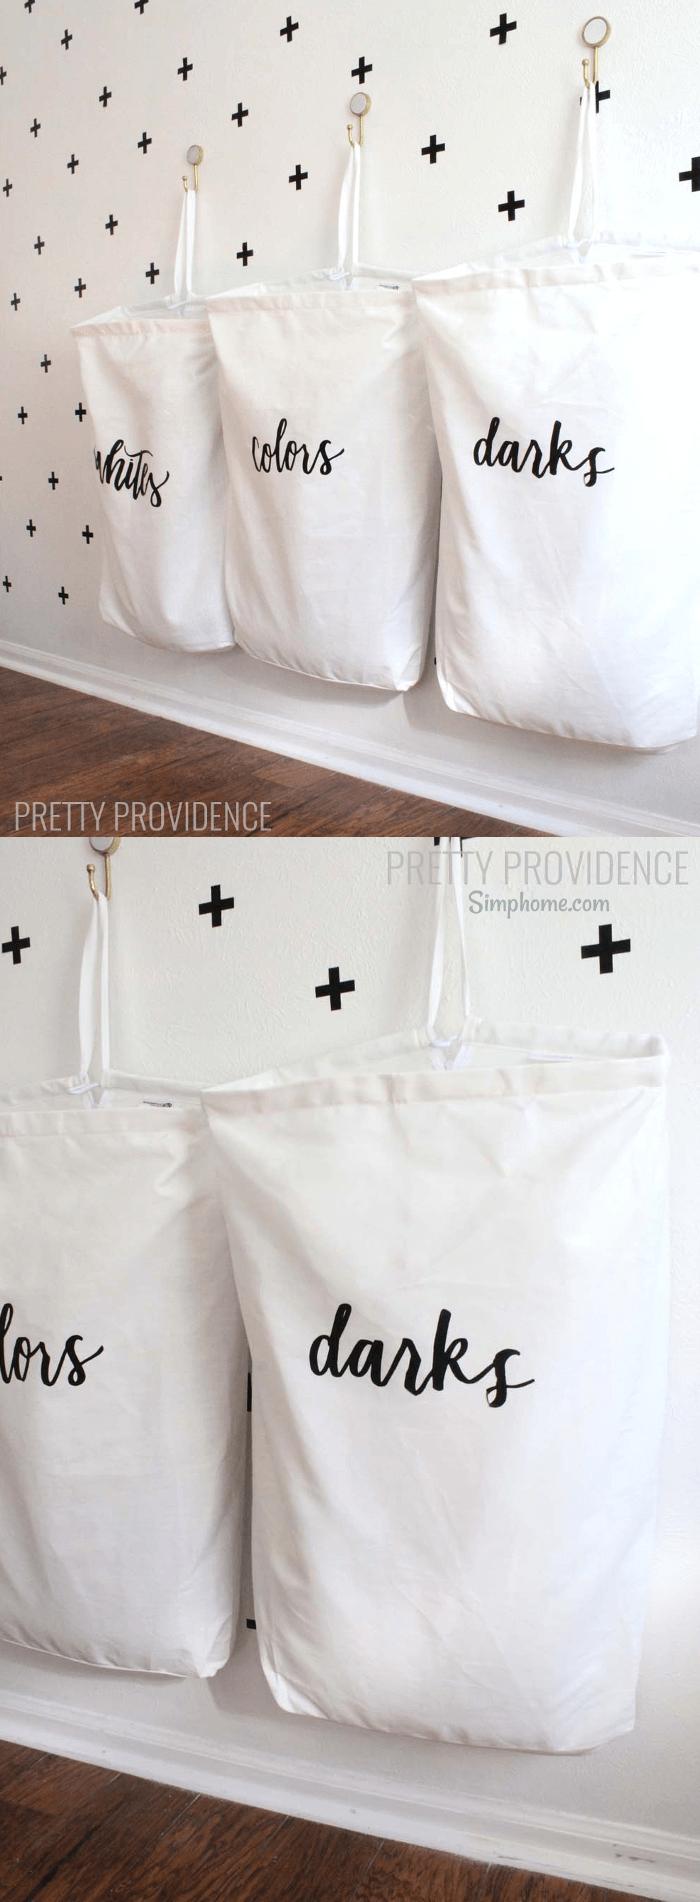 DIY LAUNDRY ORGANIZATION BAGS 20 Simphome com p